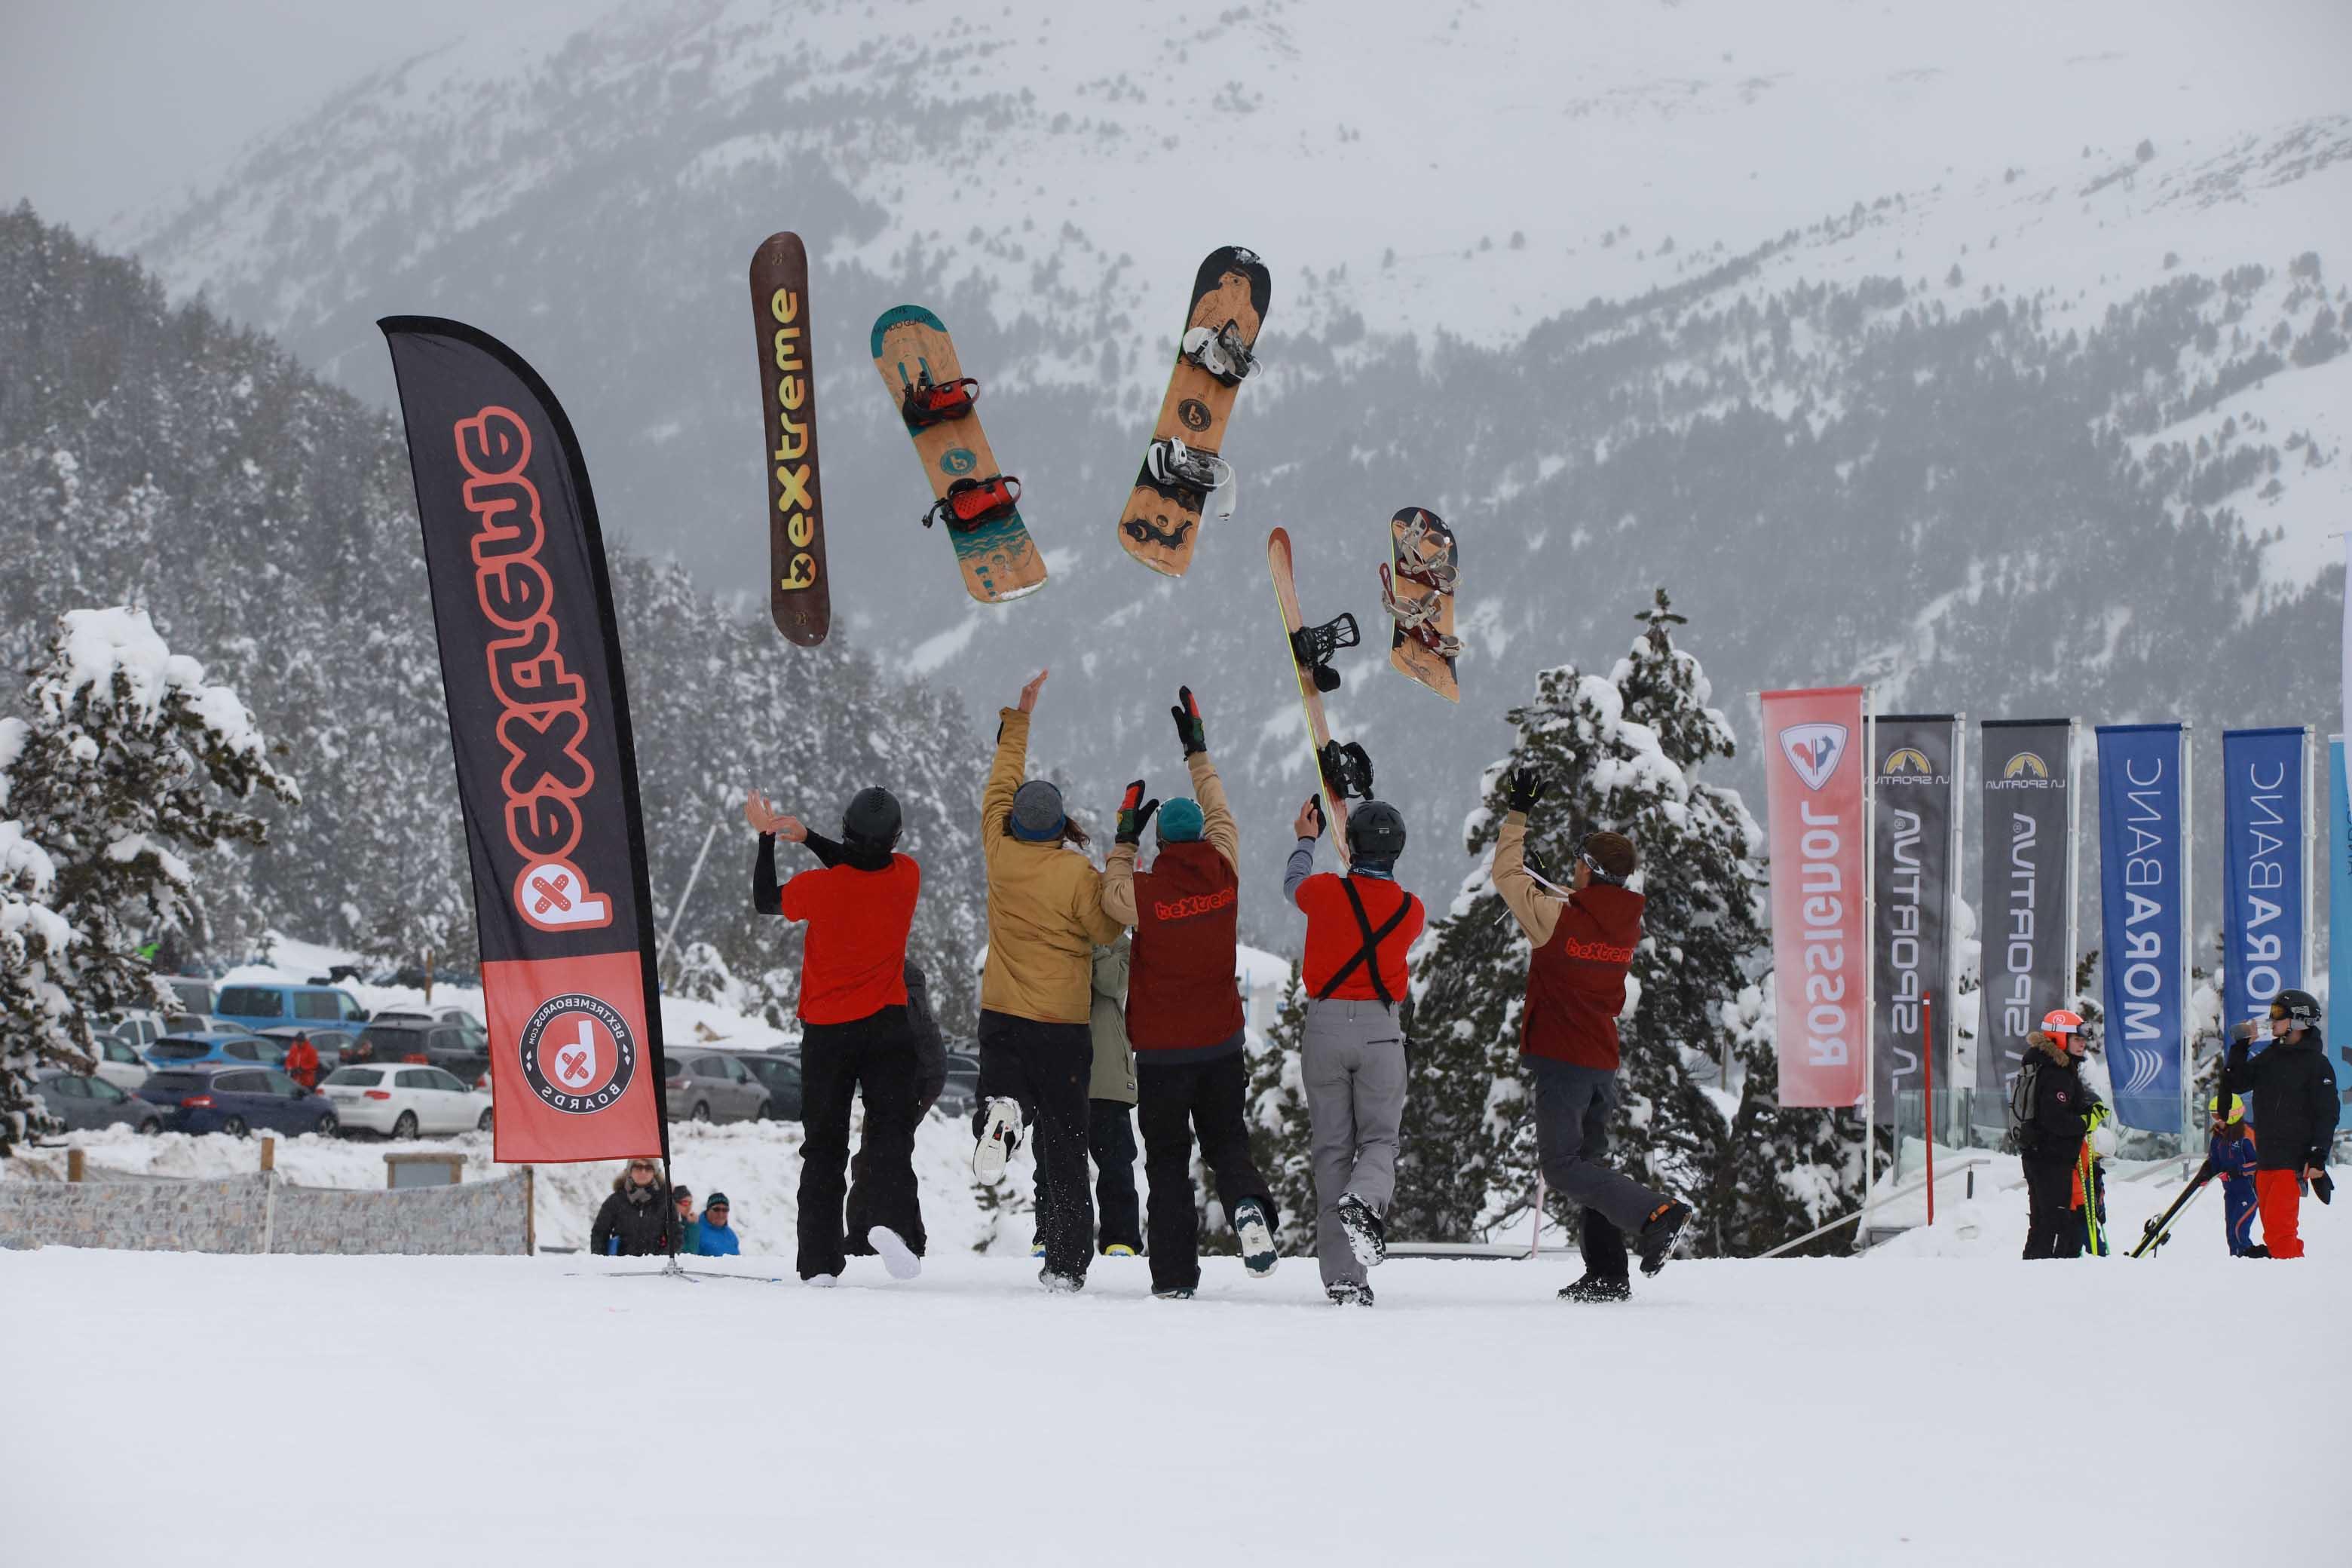 Bextreme Snowboard